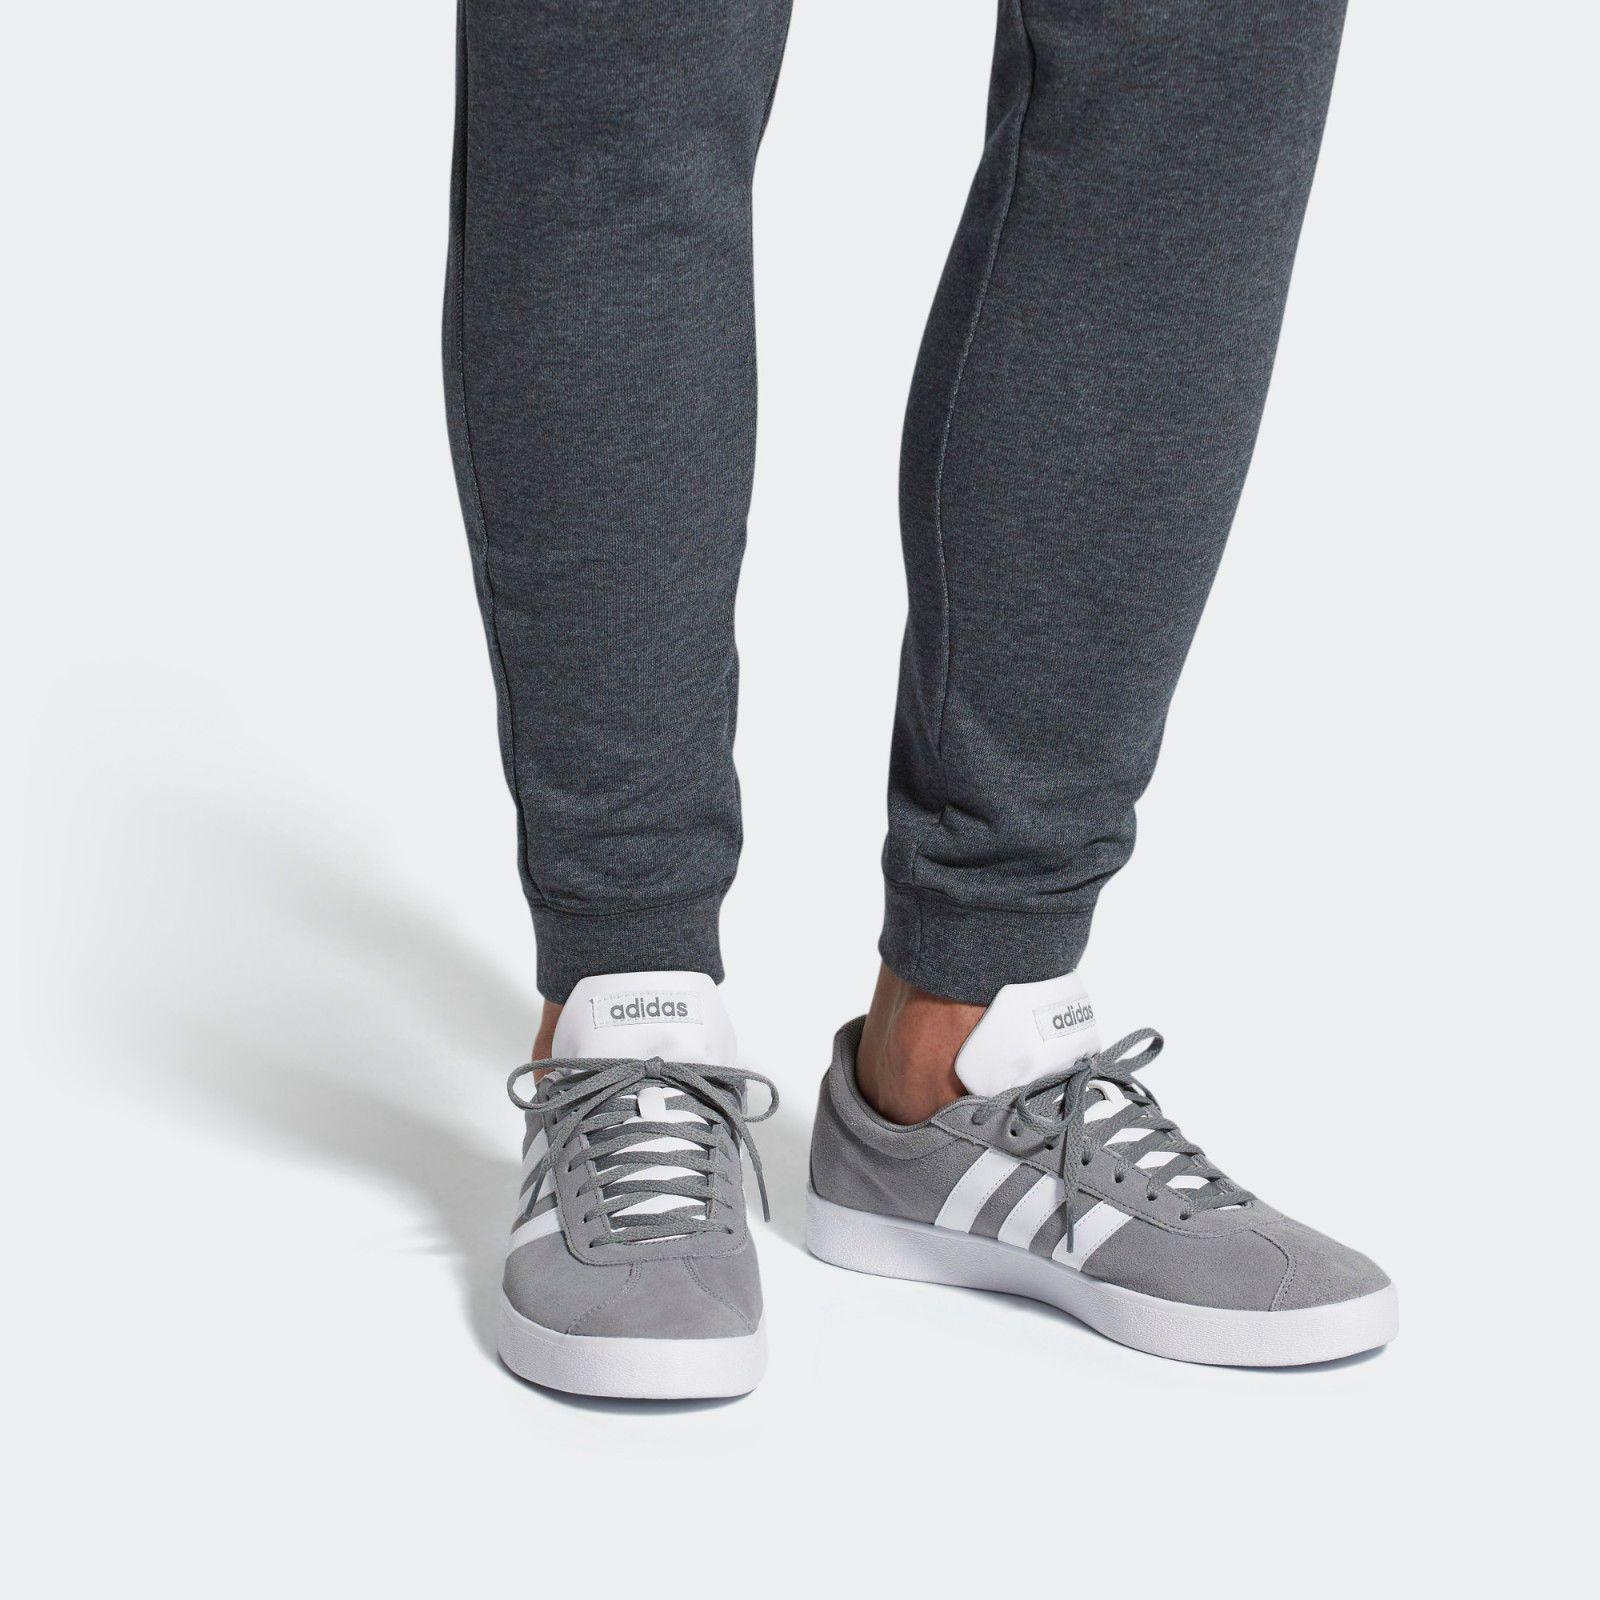 1461741d0ab9 Mens Adidas VL Court 2.0 Grey Suede Sport Athletic Skate Shoes B43807 Sz  9-11.5